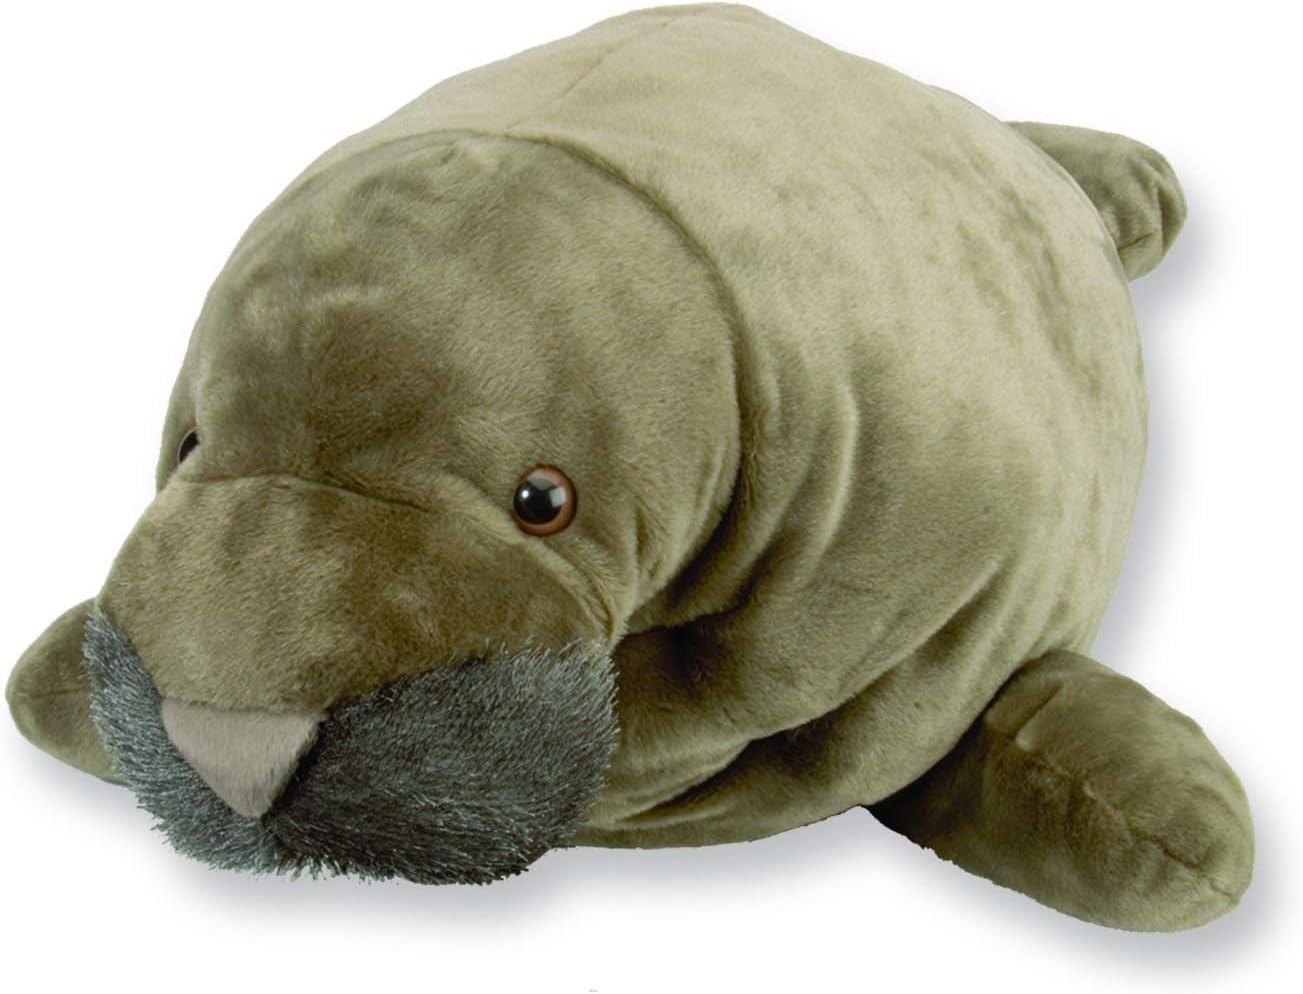 Wild Republic Jumbo Manatee Plush, Giant Stuffed Animal, Plush Toy, Gifts for Kids, 30 Inches